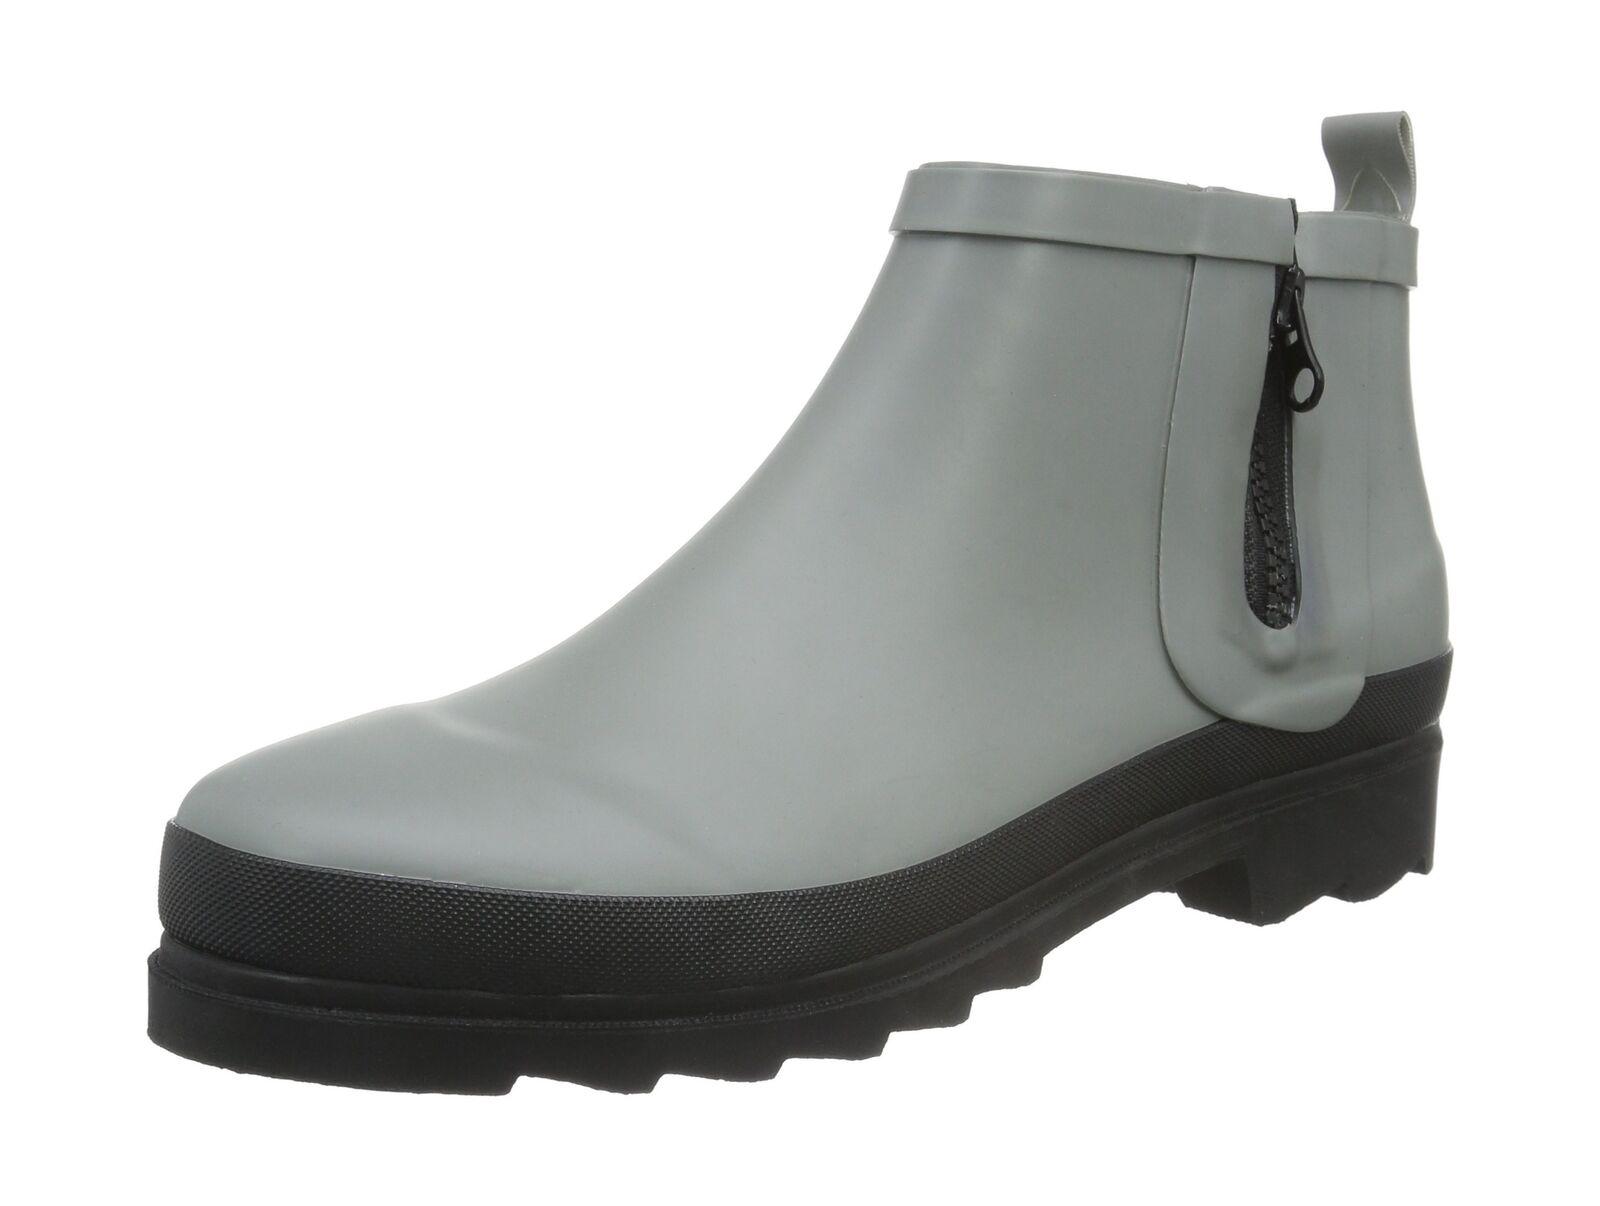 Sanita Women's Fiona Welly Ankle Boots Grey - grey (Grey 20) 6.5 UK